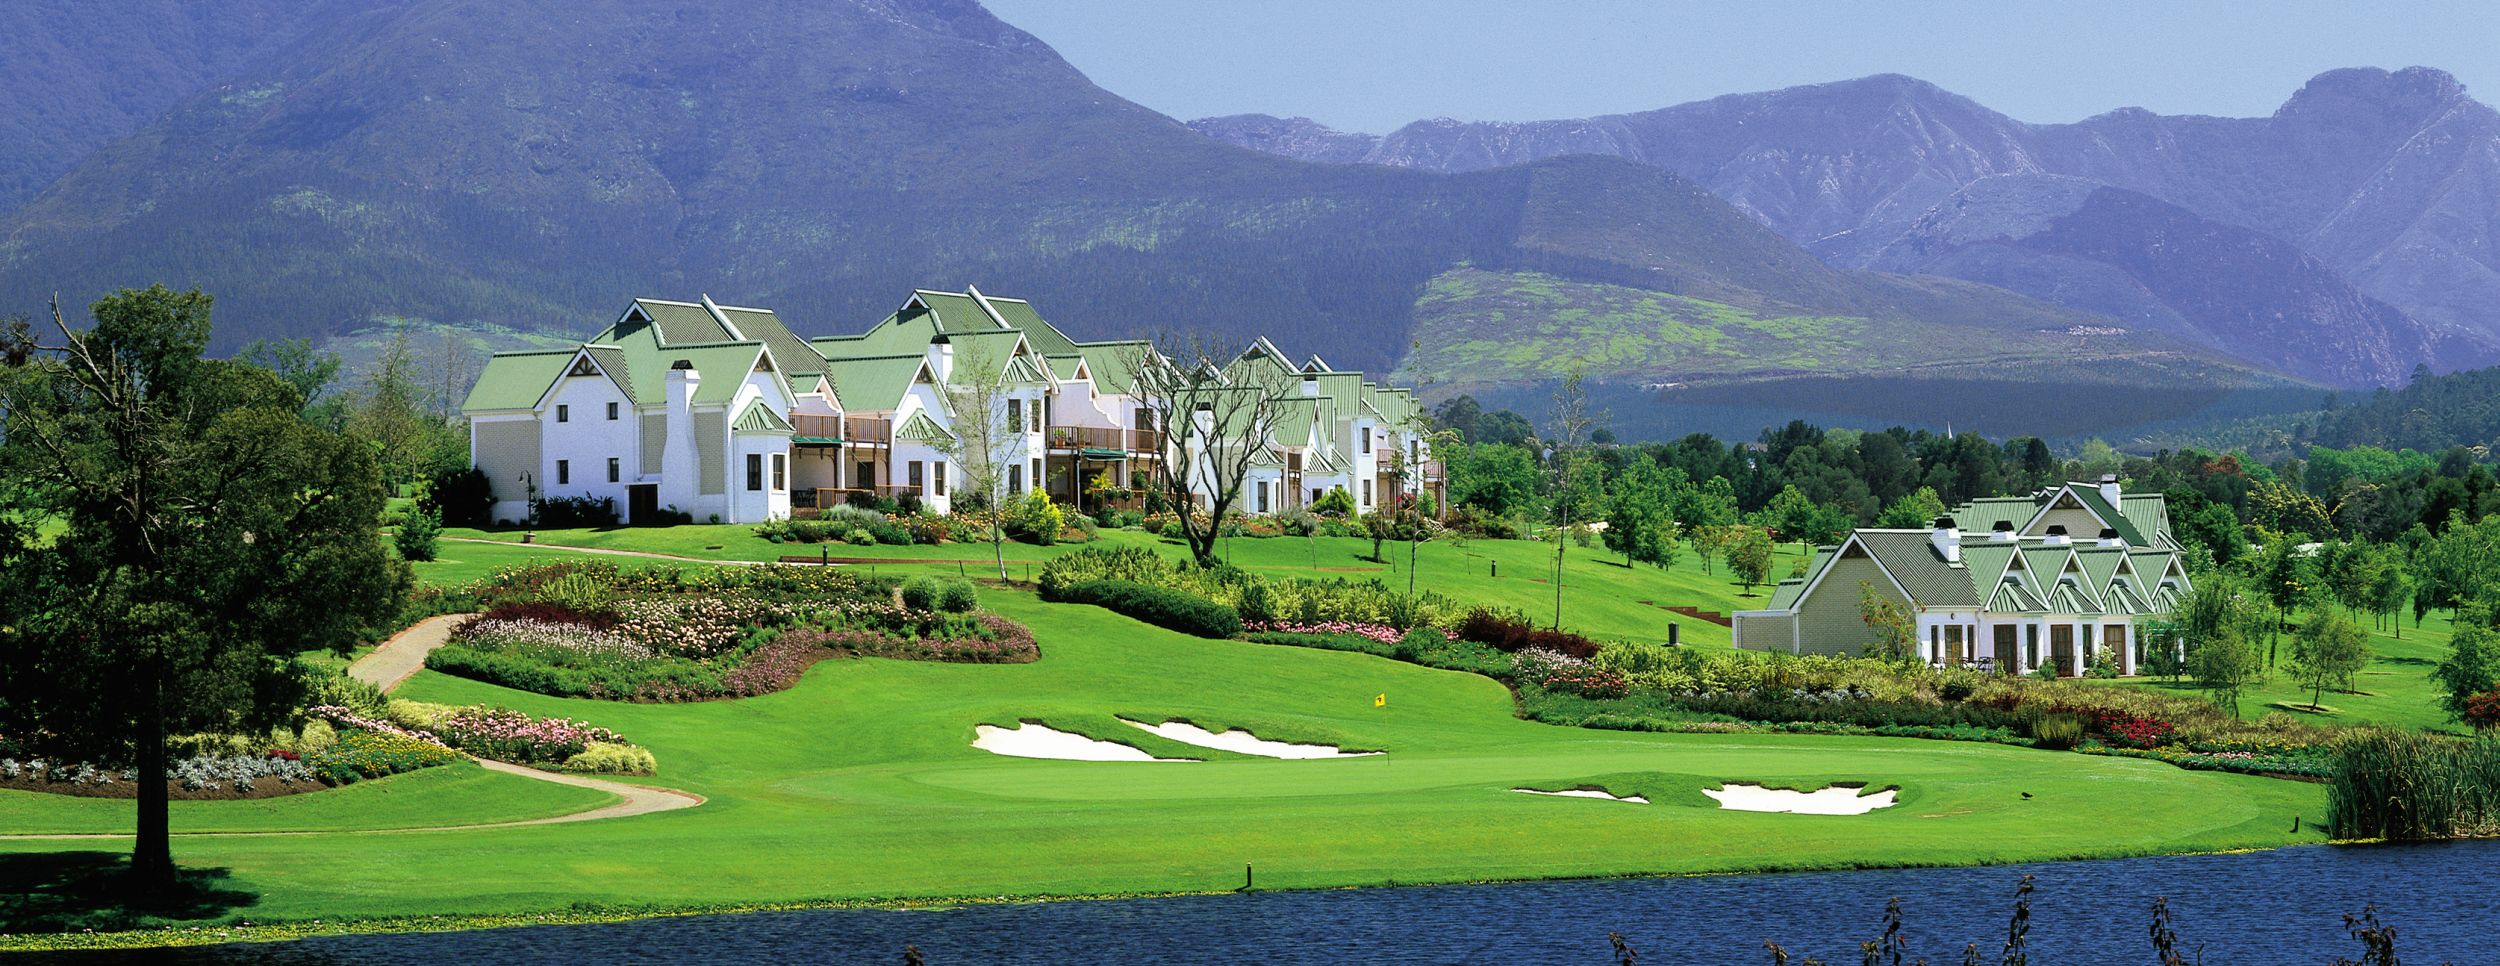 golf-expedition-golfreizen-zuid-afrika-heerlijk-golfen-mooiste-golfbanen